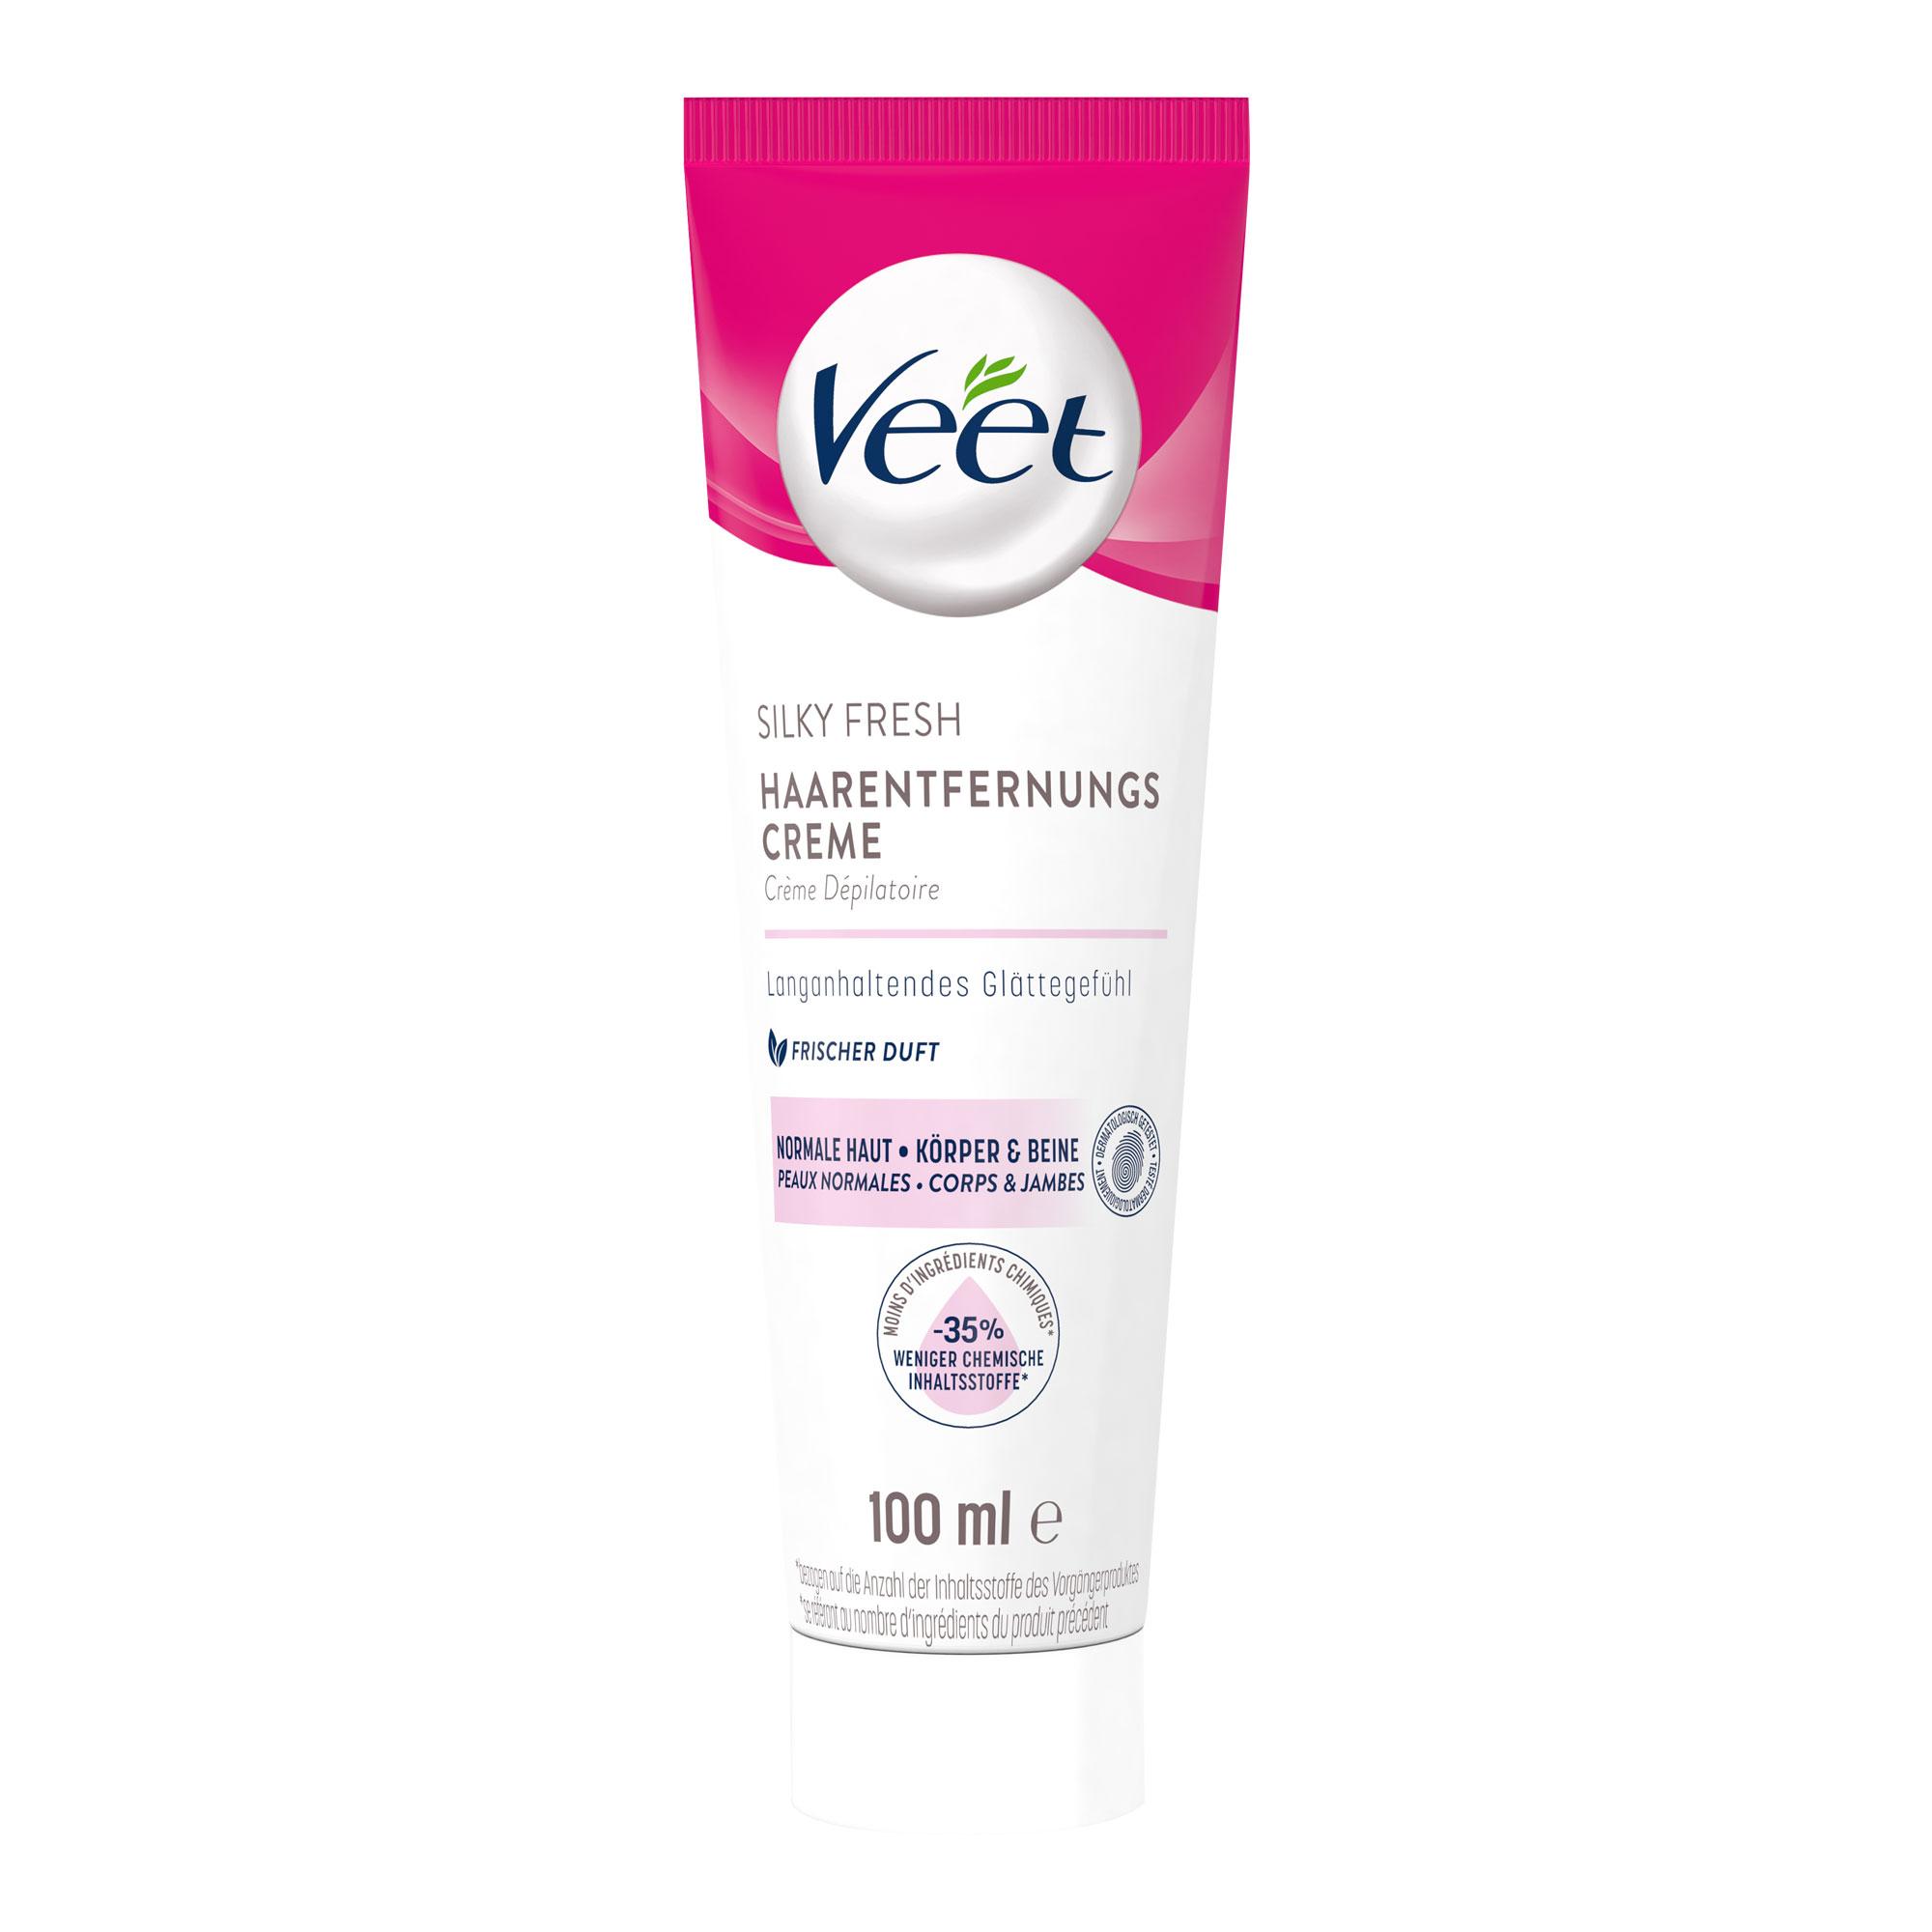 Veet Haarentfernungs-Creme für normale Haut